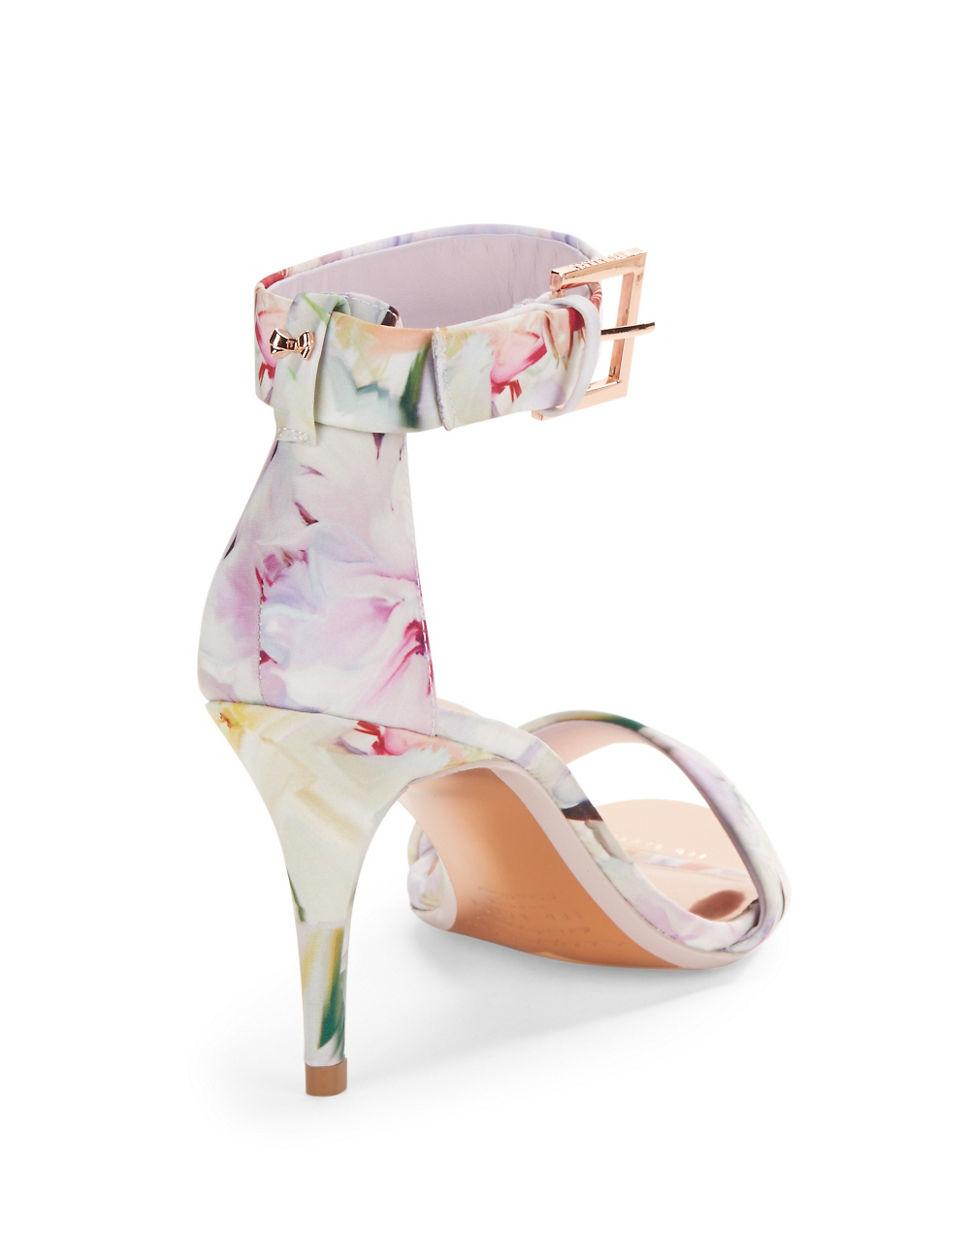 7ba5fd51f Ted Baker Blynne Floral Open-toe Sandals in White - Lyst